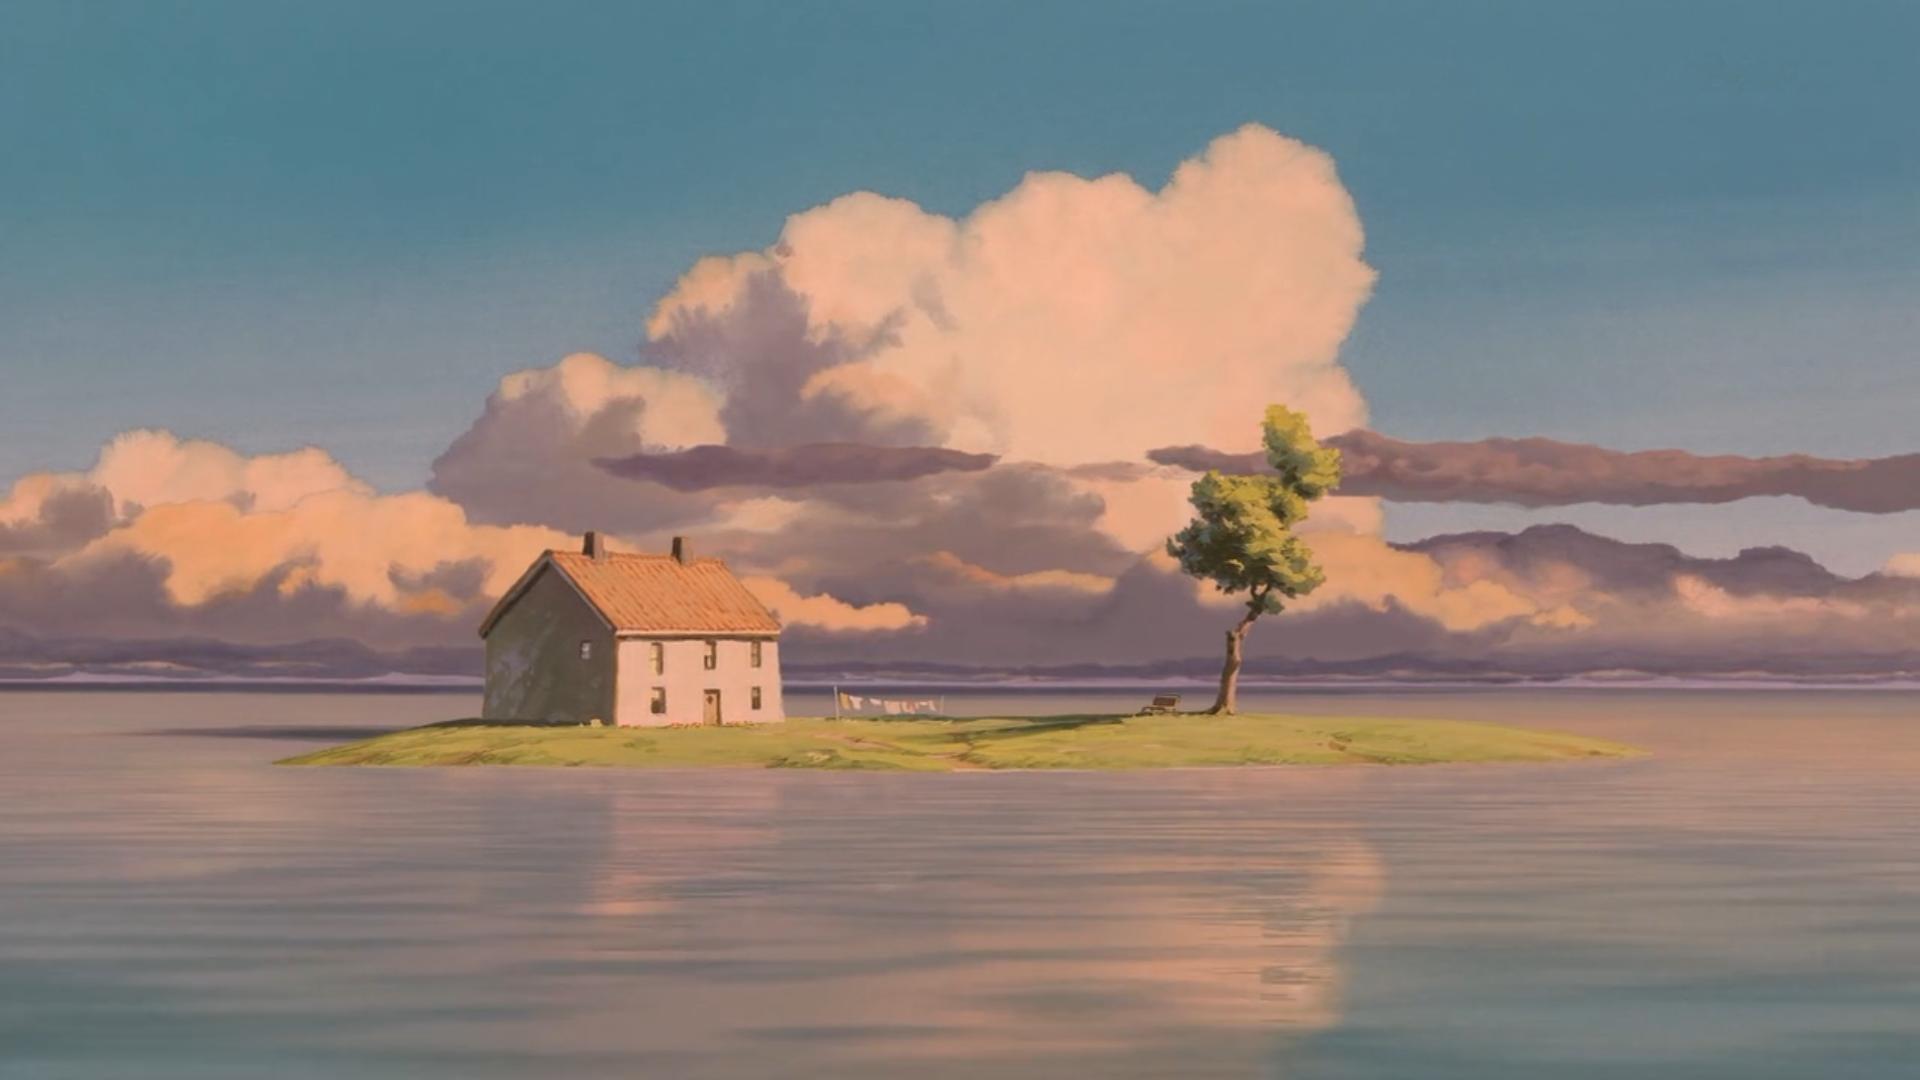 Spirited Away (train journey) by Hayao Miyazaki Scenery